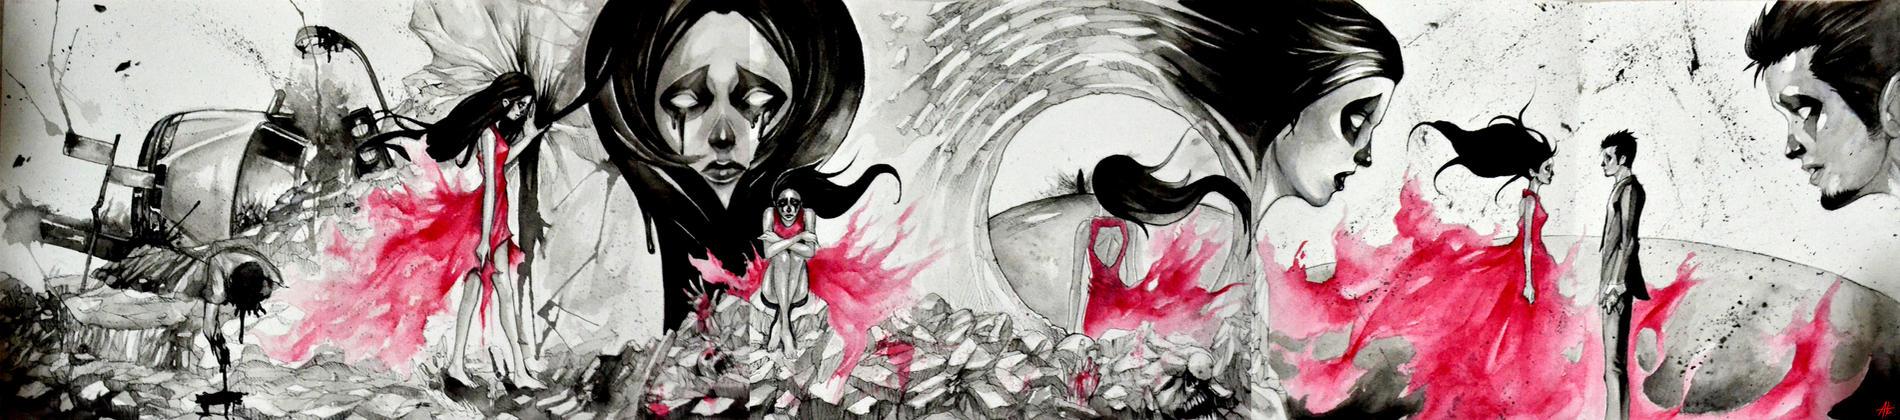 Die lovely by AbsolumTerror